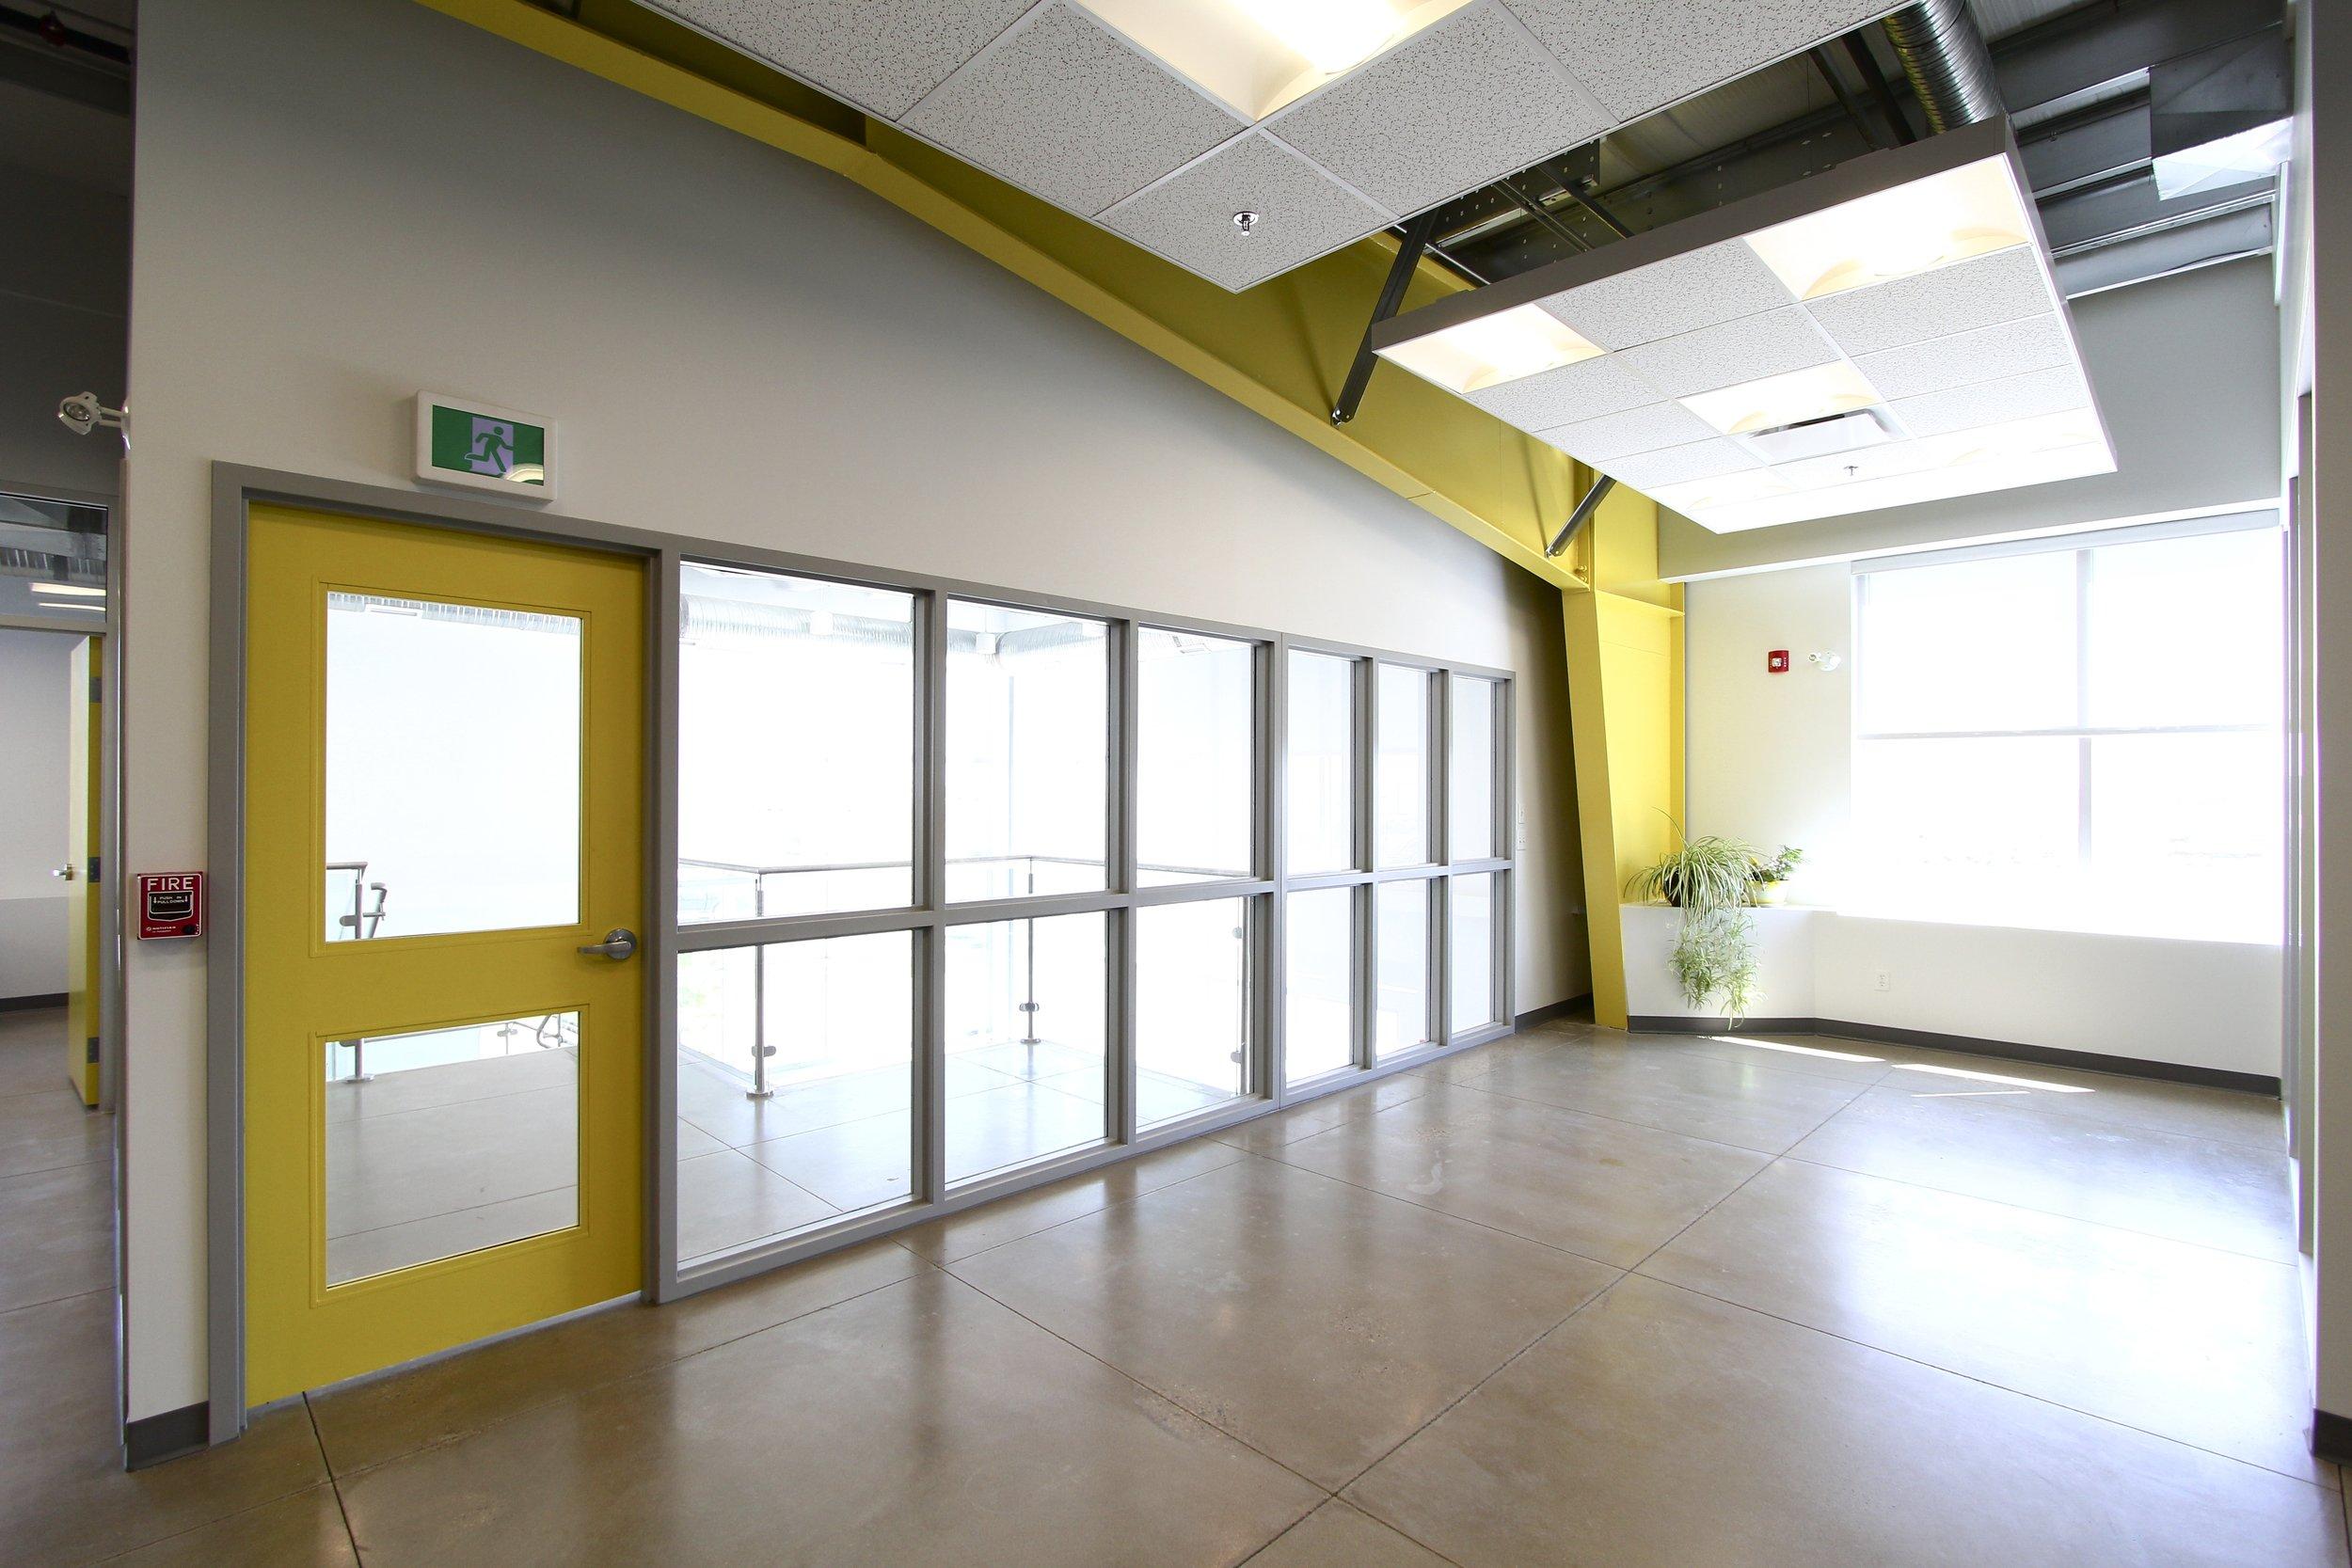 Metric Design, Interior Design, Saskatoon, Renovations, Yellow door, Entrance Bulkheads.jpg